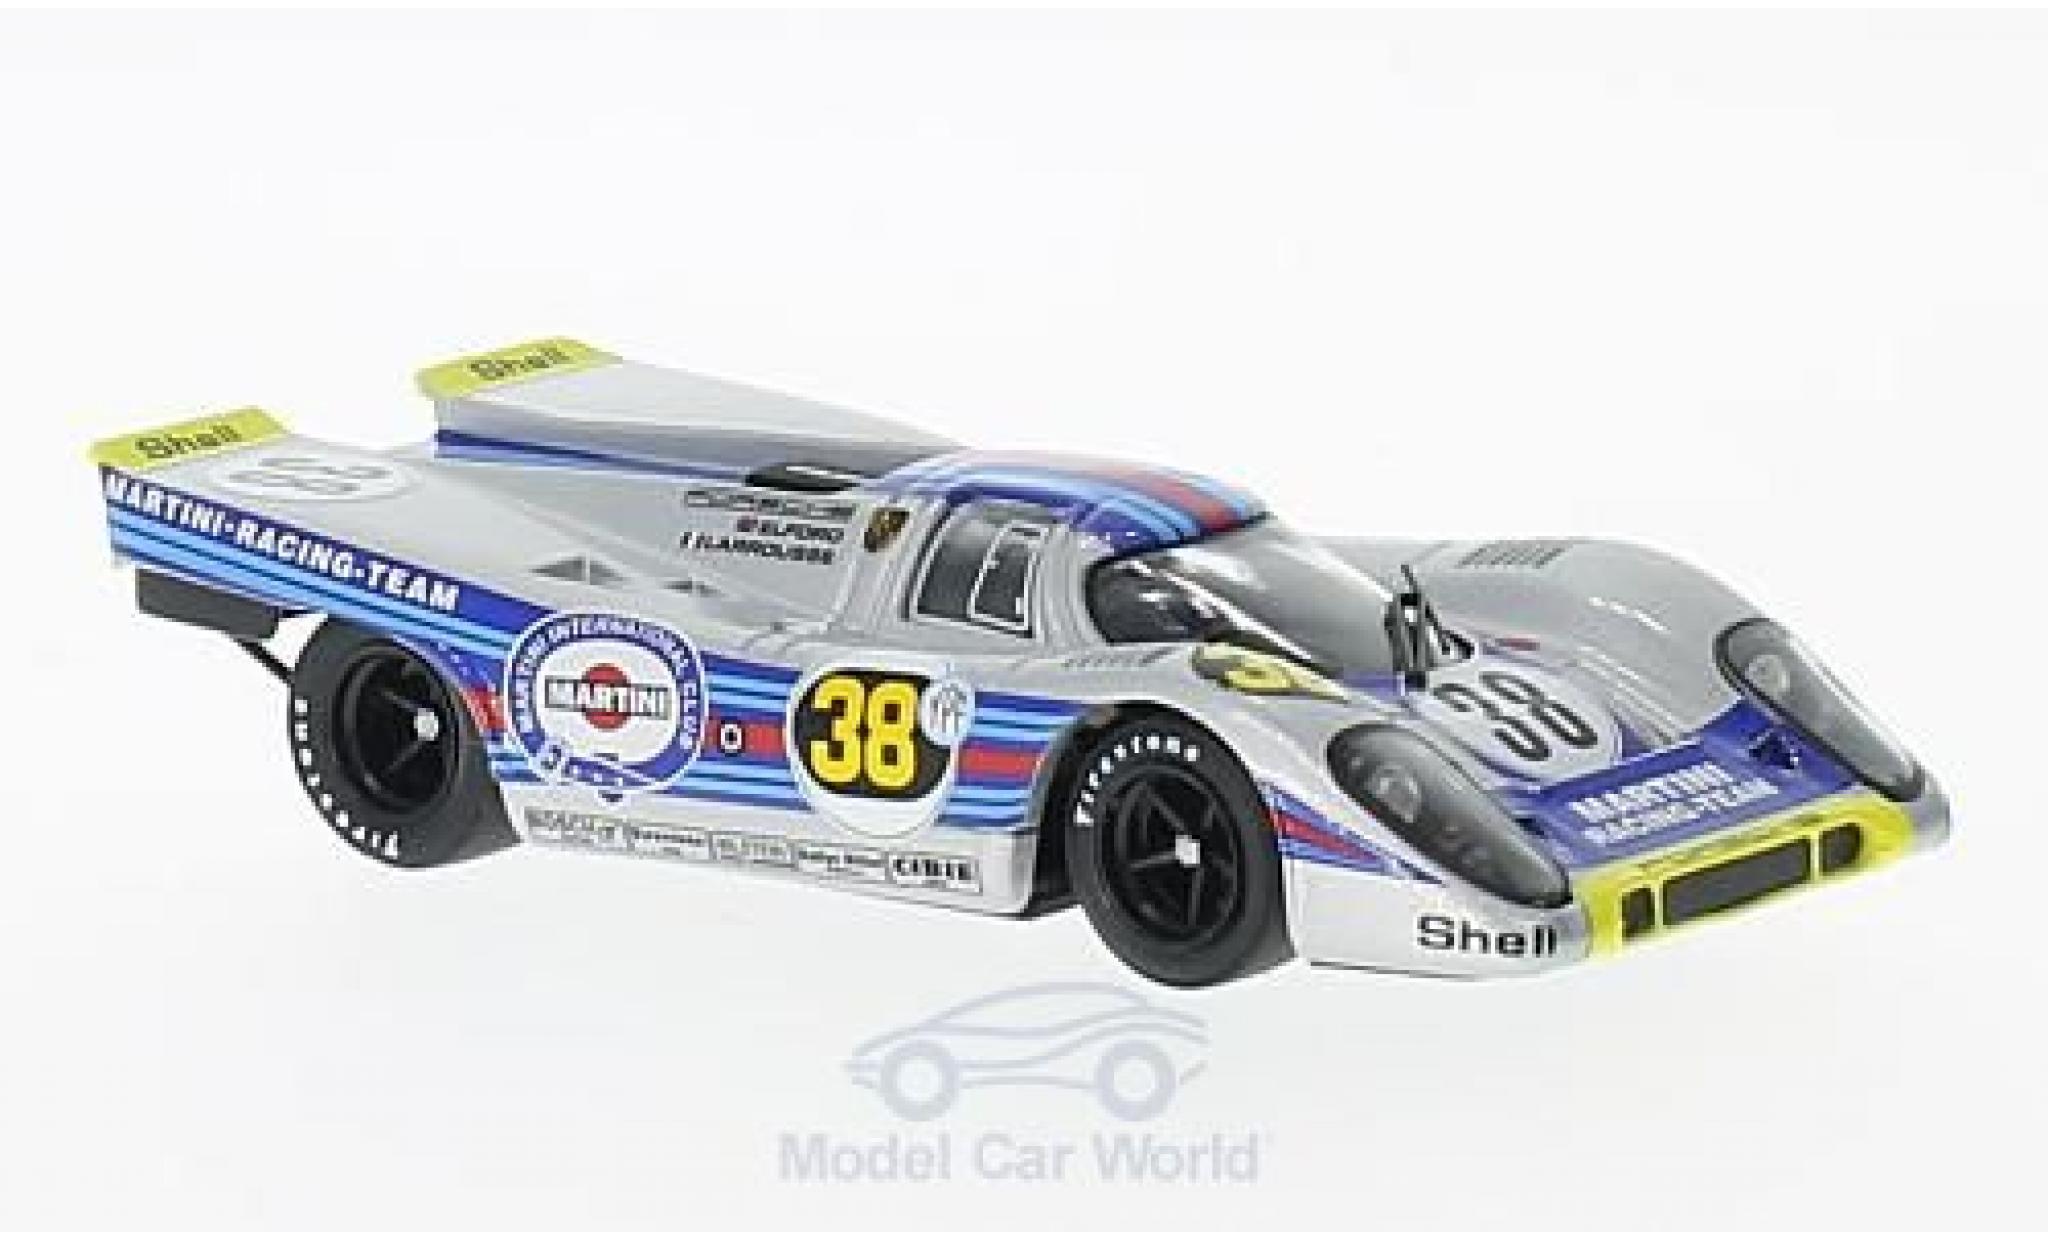 Porsche 917 K 1/43 Brumm K No.38 Martini Racing Team Martini 1000 Km Buenos Aires 1971 V.Elford/G.Larrousse